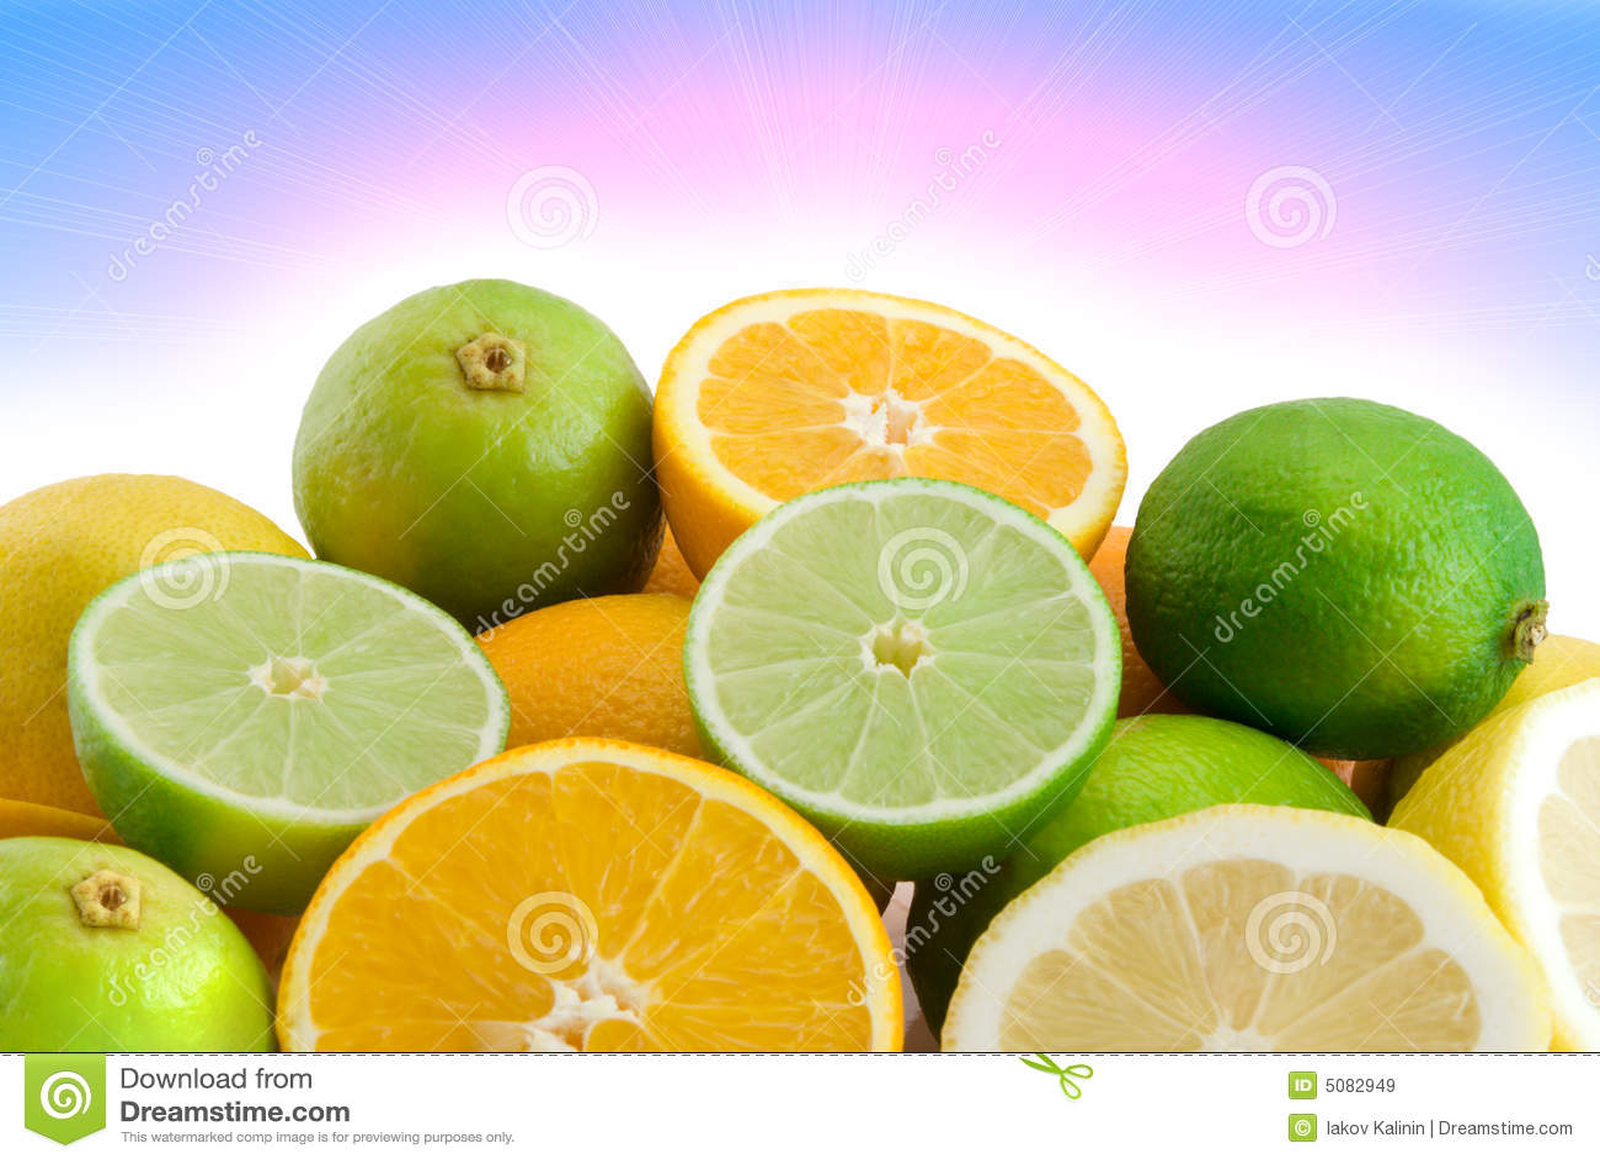 Citrus and sun